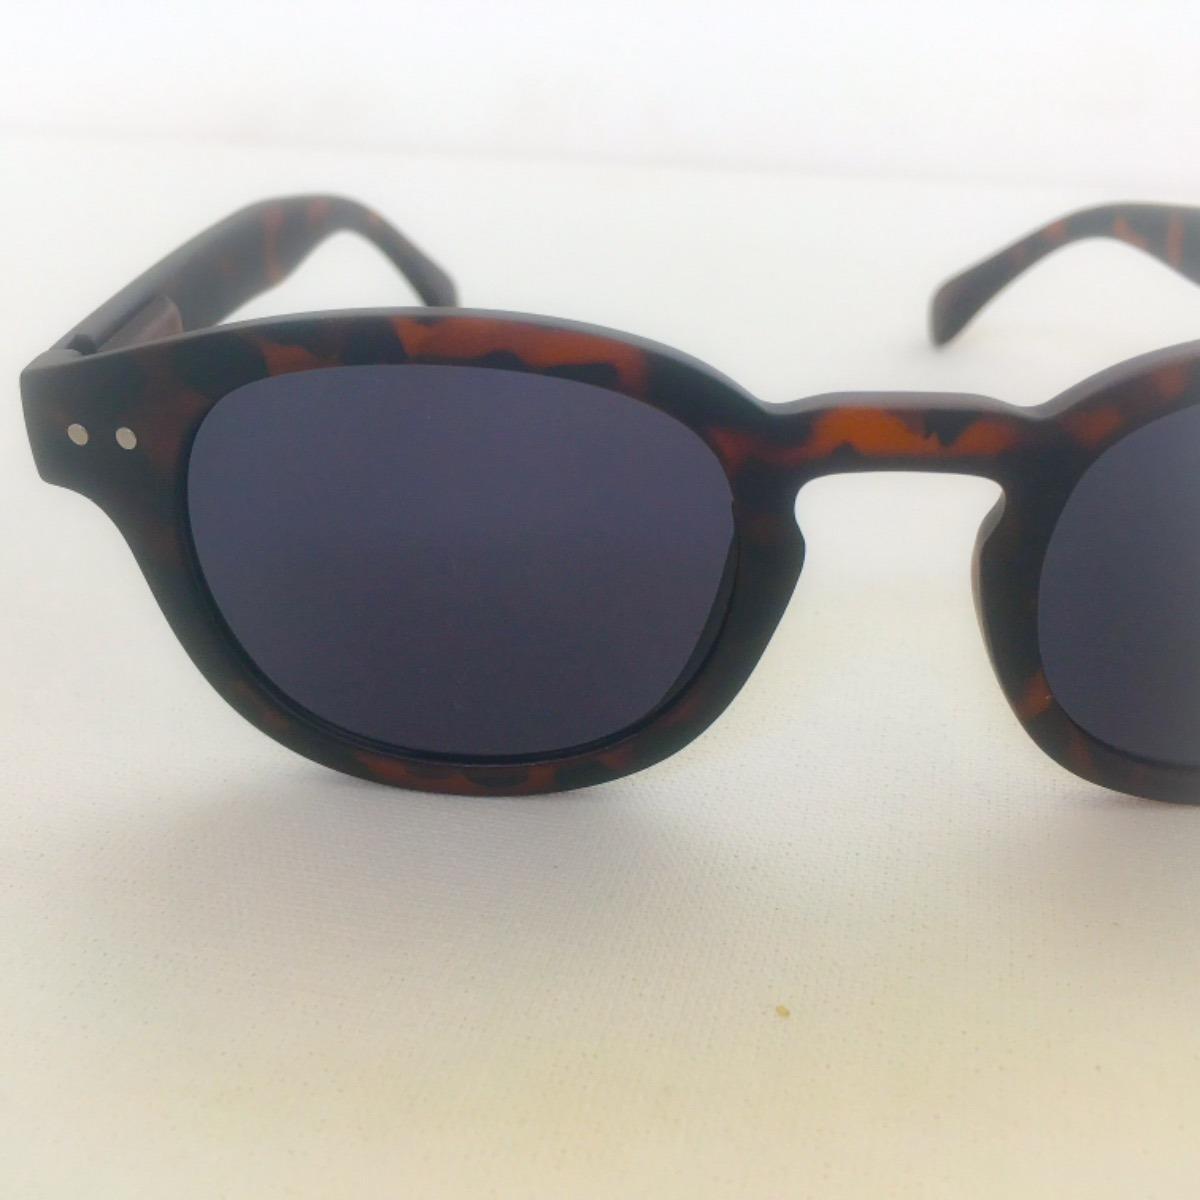 aebc6cc5ab162 Óculos Estilo Johnny Depp Tortoise Fosco Exclusivo - R  200,00 em ...